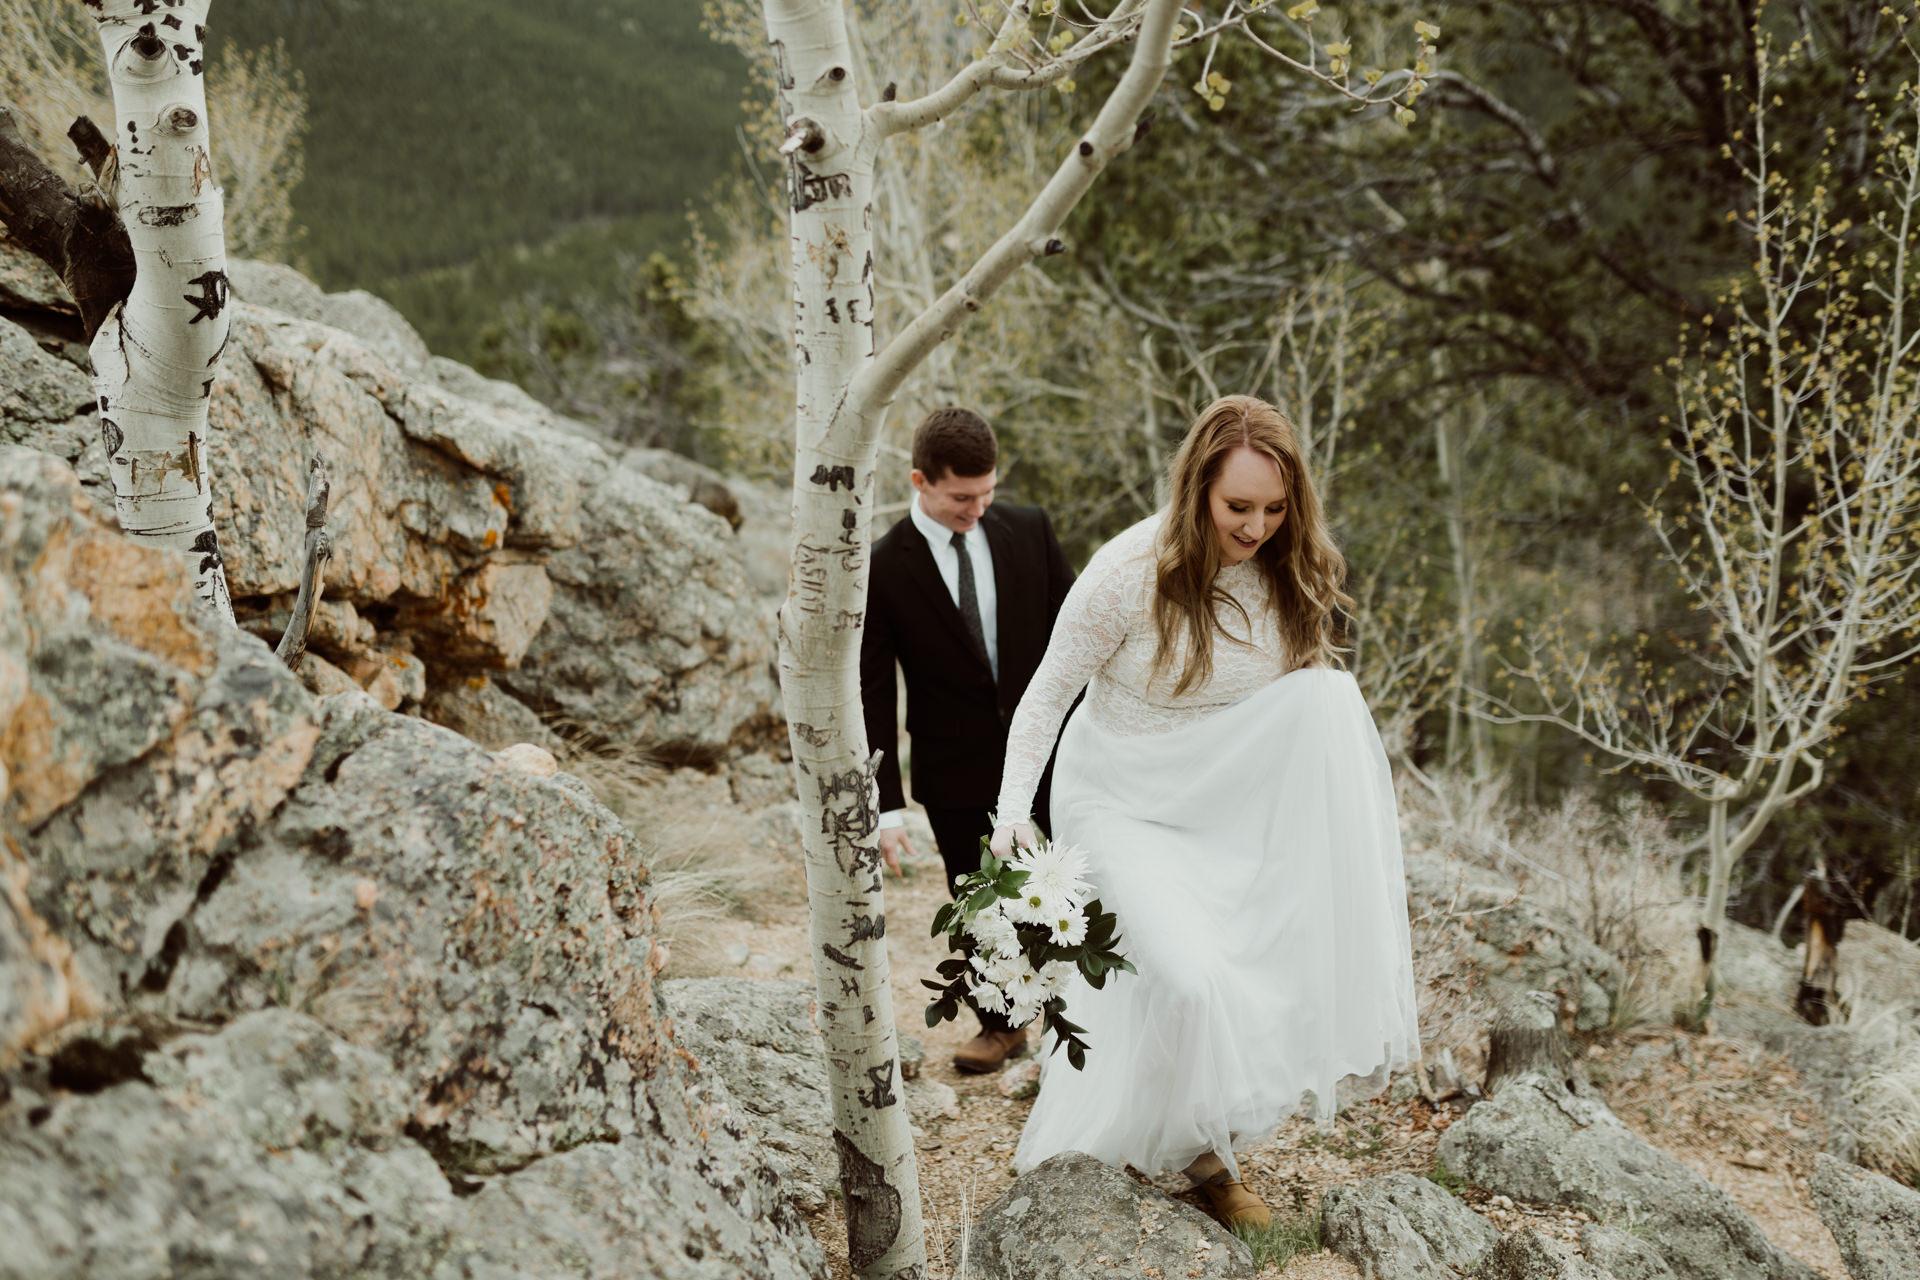 colorado-mount-evans-intimate-adventurous-elopement-7.jpg